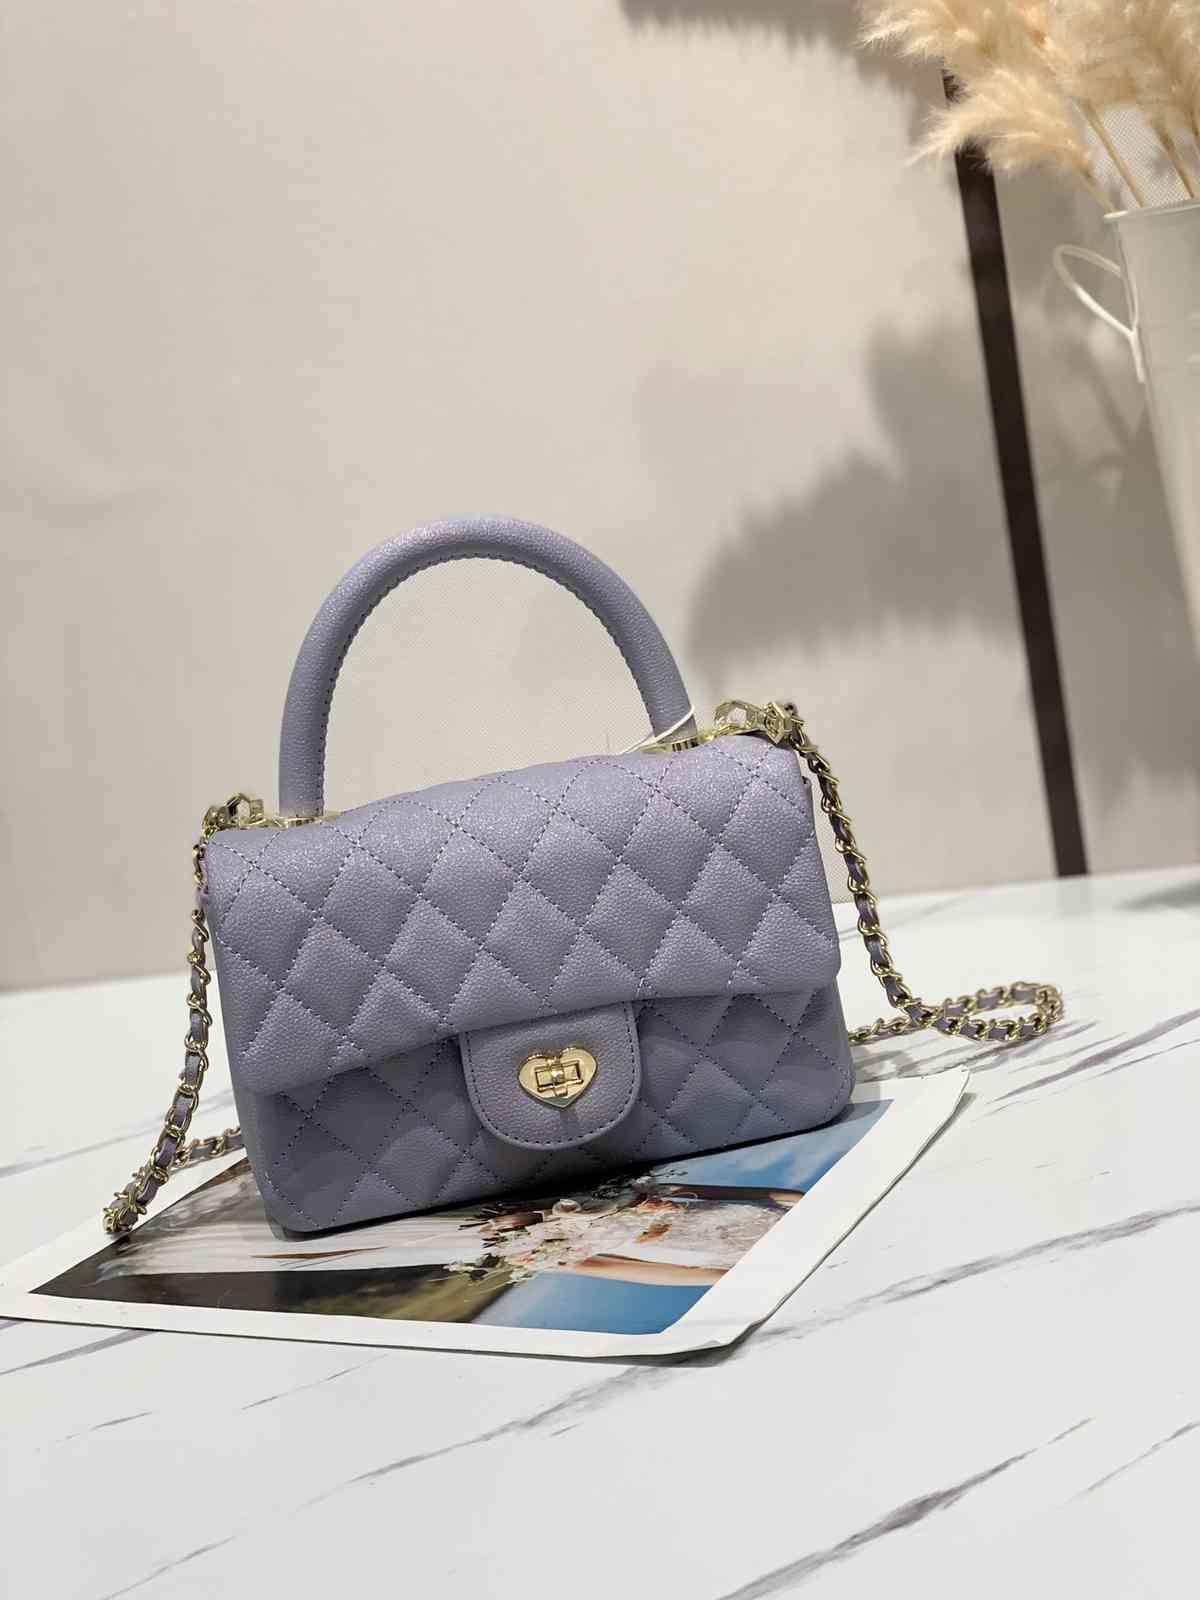 Designer handbagsMini Yangqi Lingge chain small bag autumn and winter 2020 new advanced love lock versatile one shoulder slant span bagBUWF